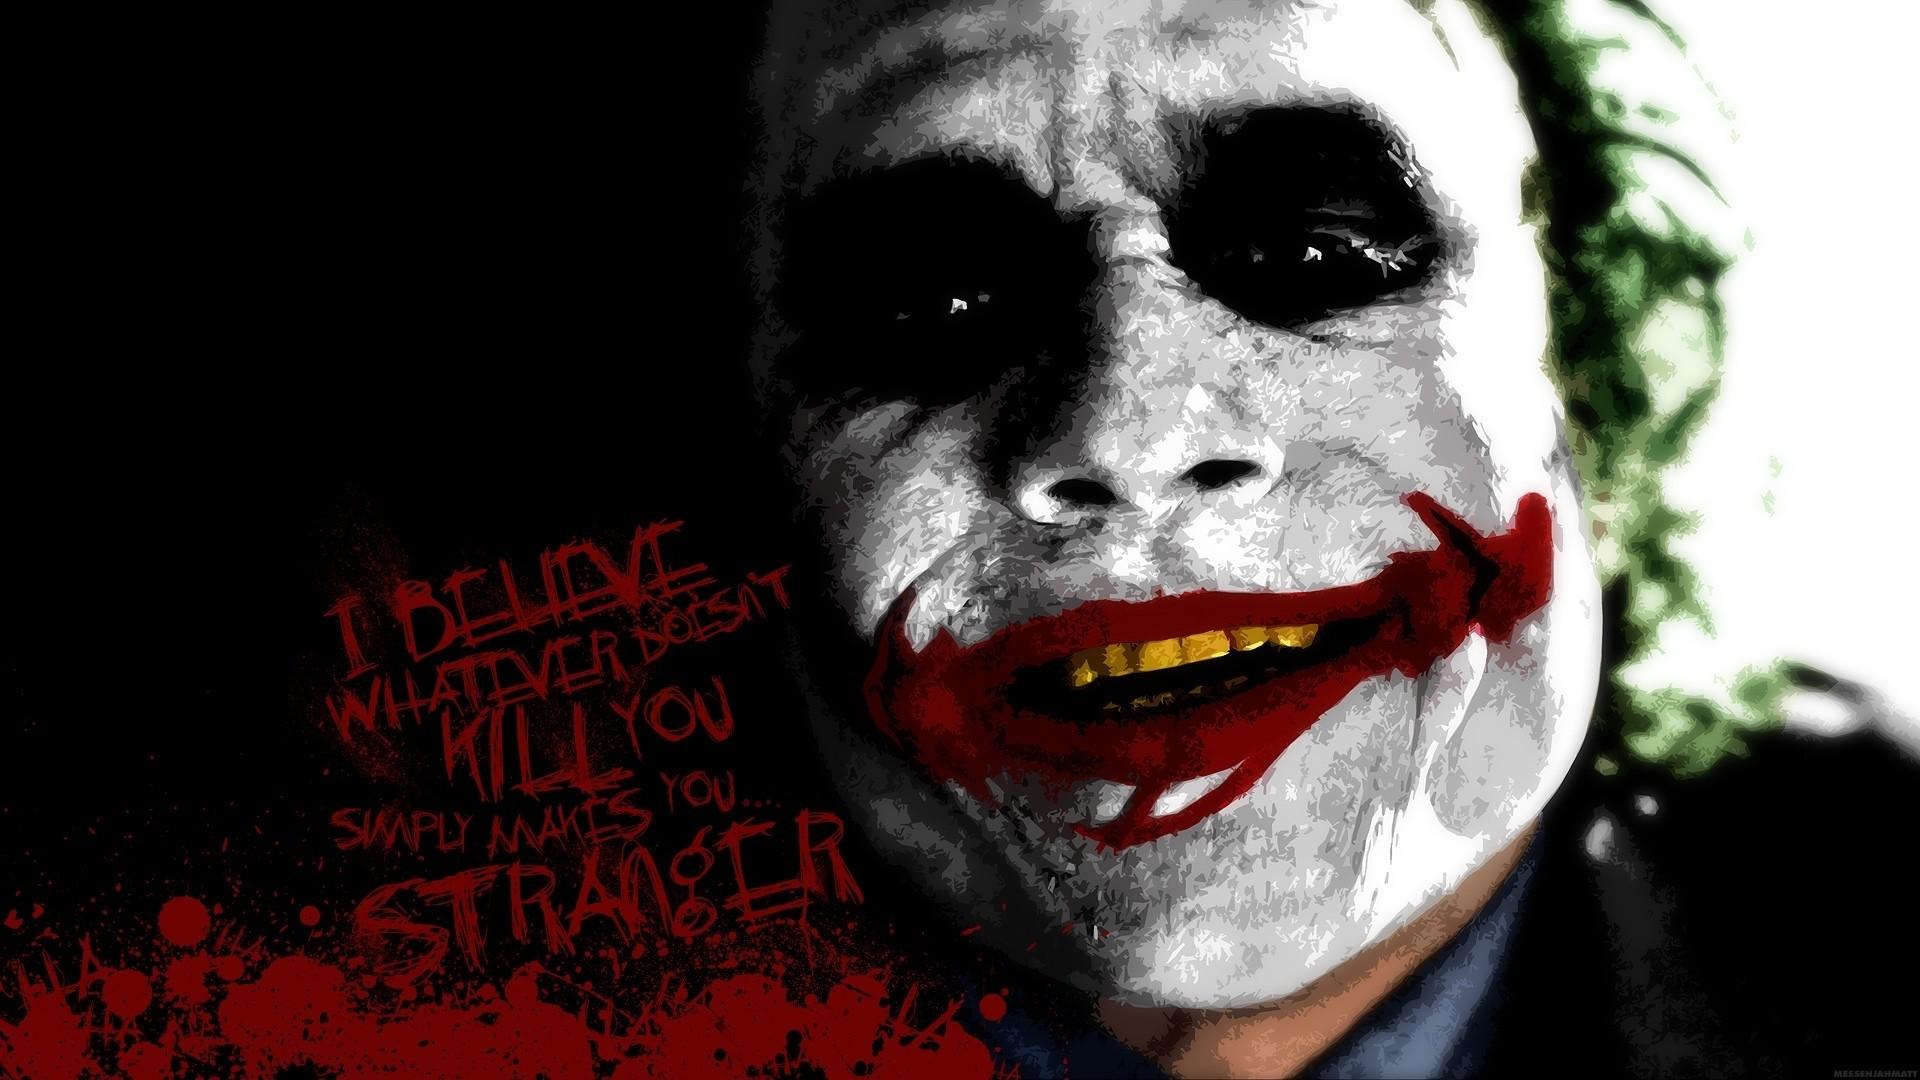 batman quotes the joker typography blood splatters smiling batman the dark  knight wallp Art HD